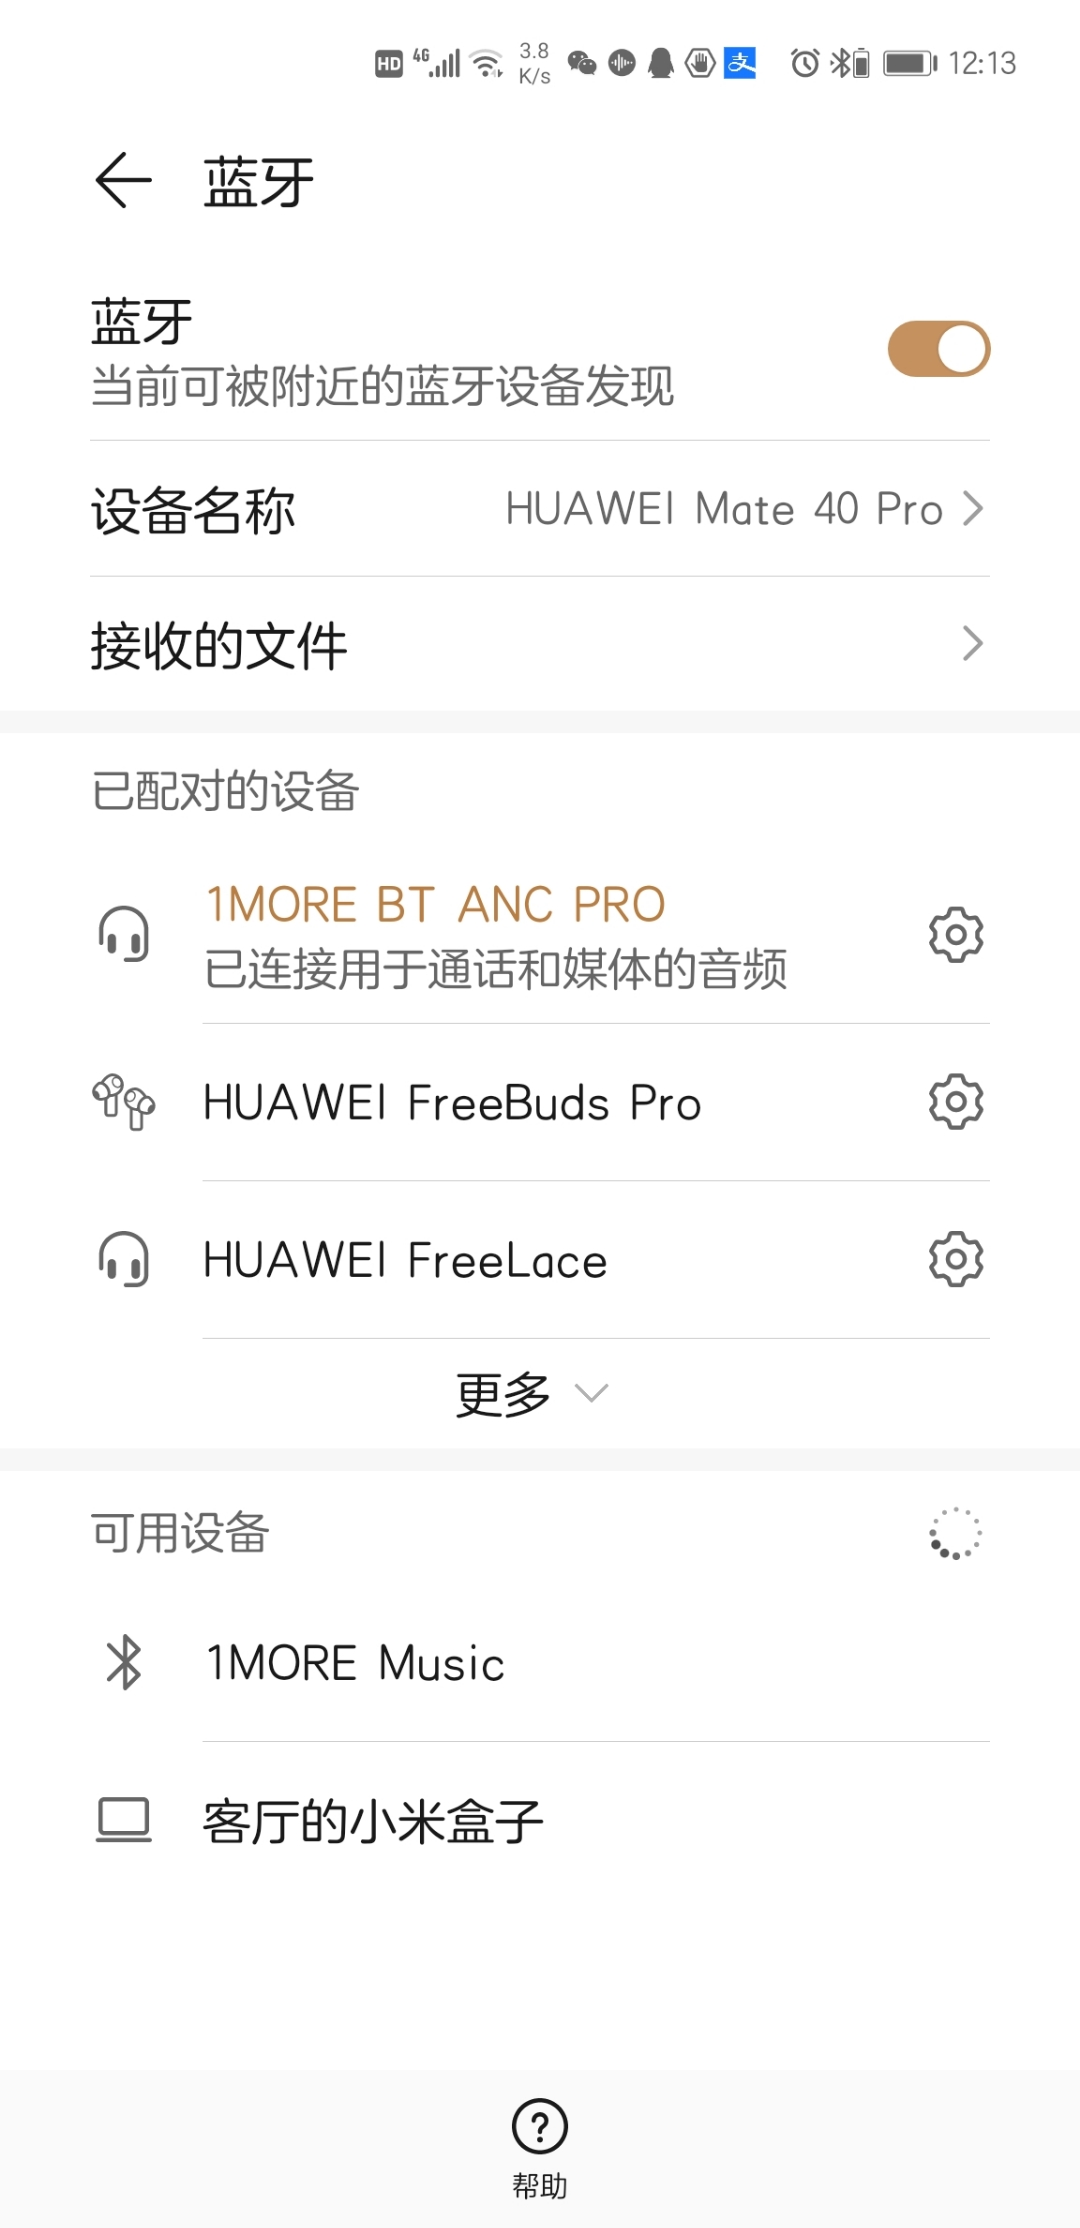 Screenshot_20201130_121308_com.android.settings.jpg